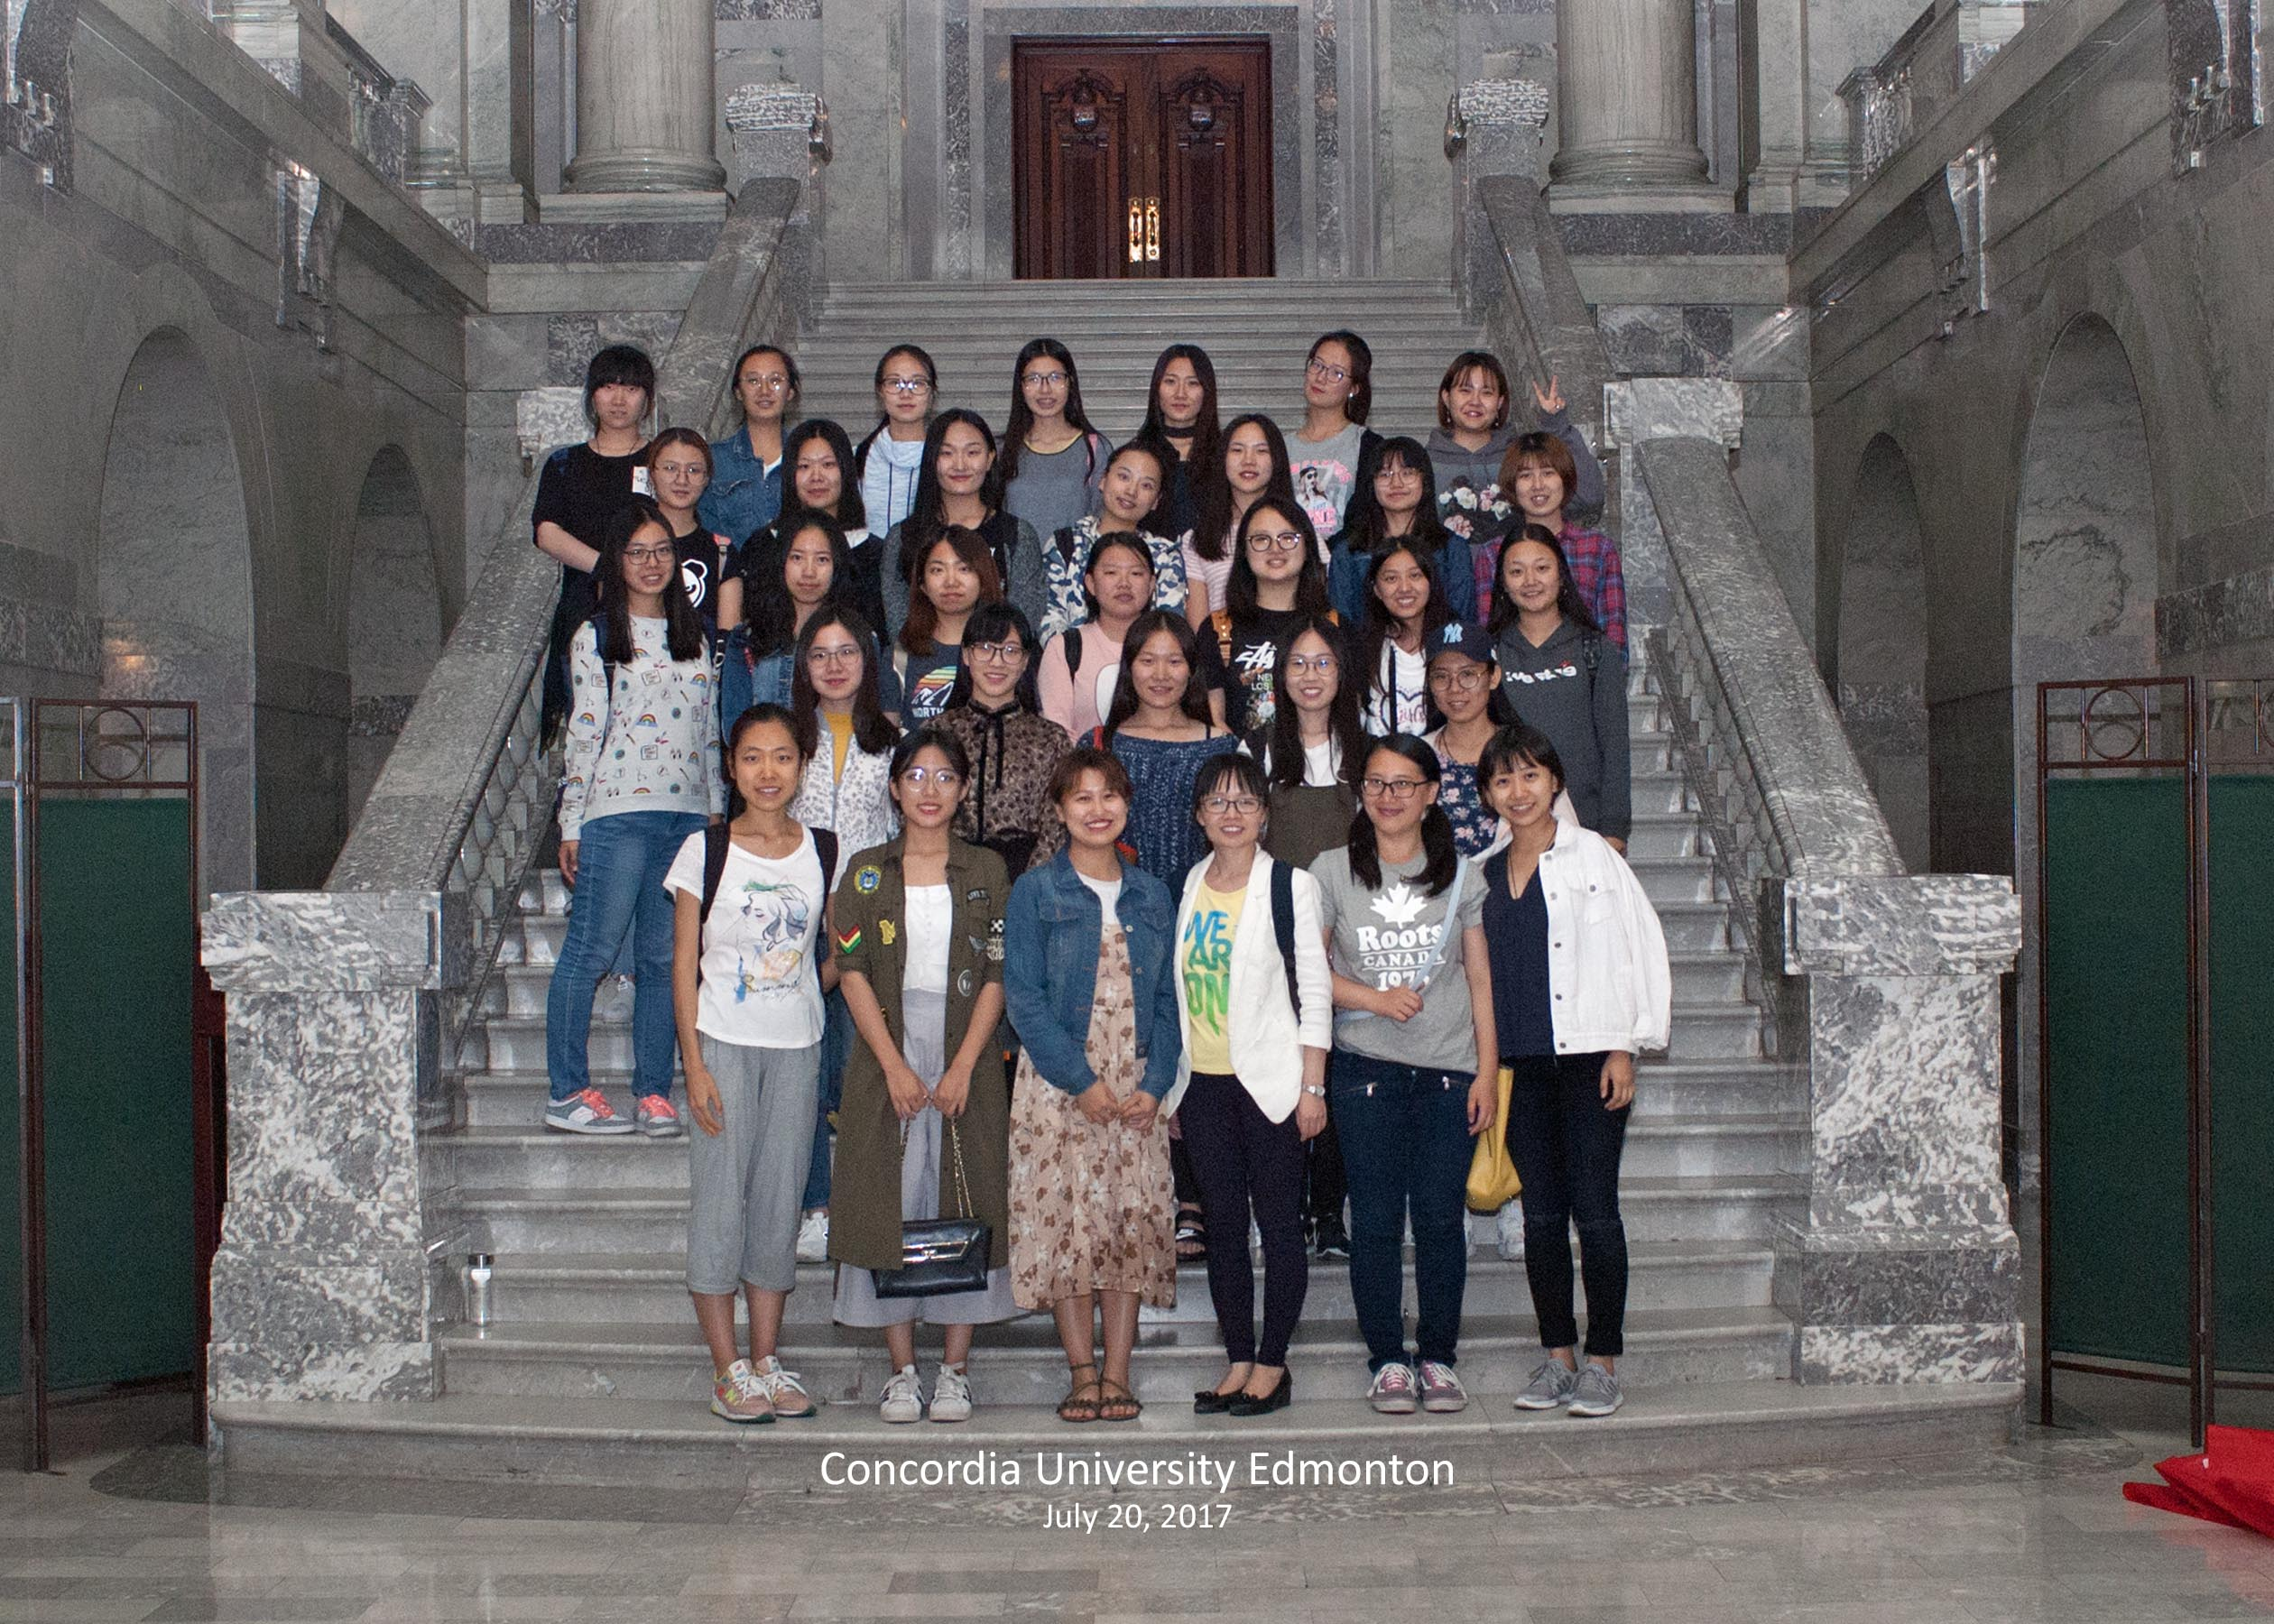 Cnu Graduation 2020.Invitation To Graduation Ceremony Of Cnu China Students